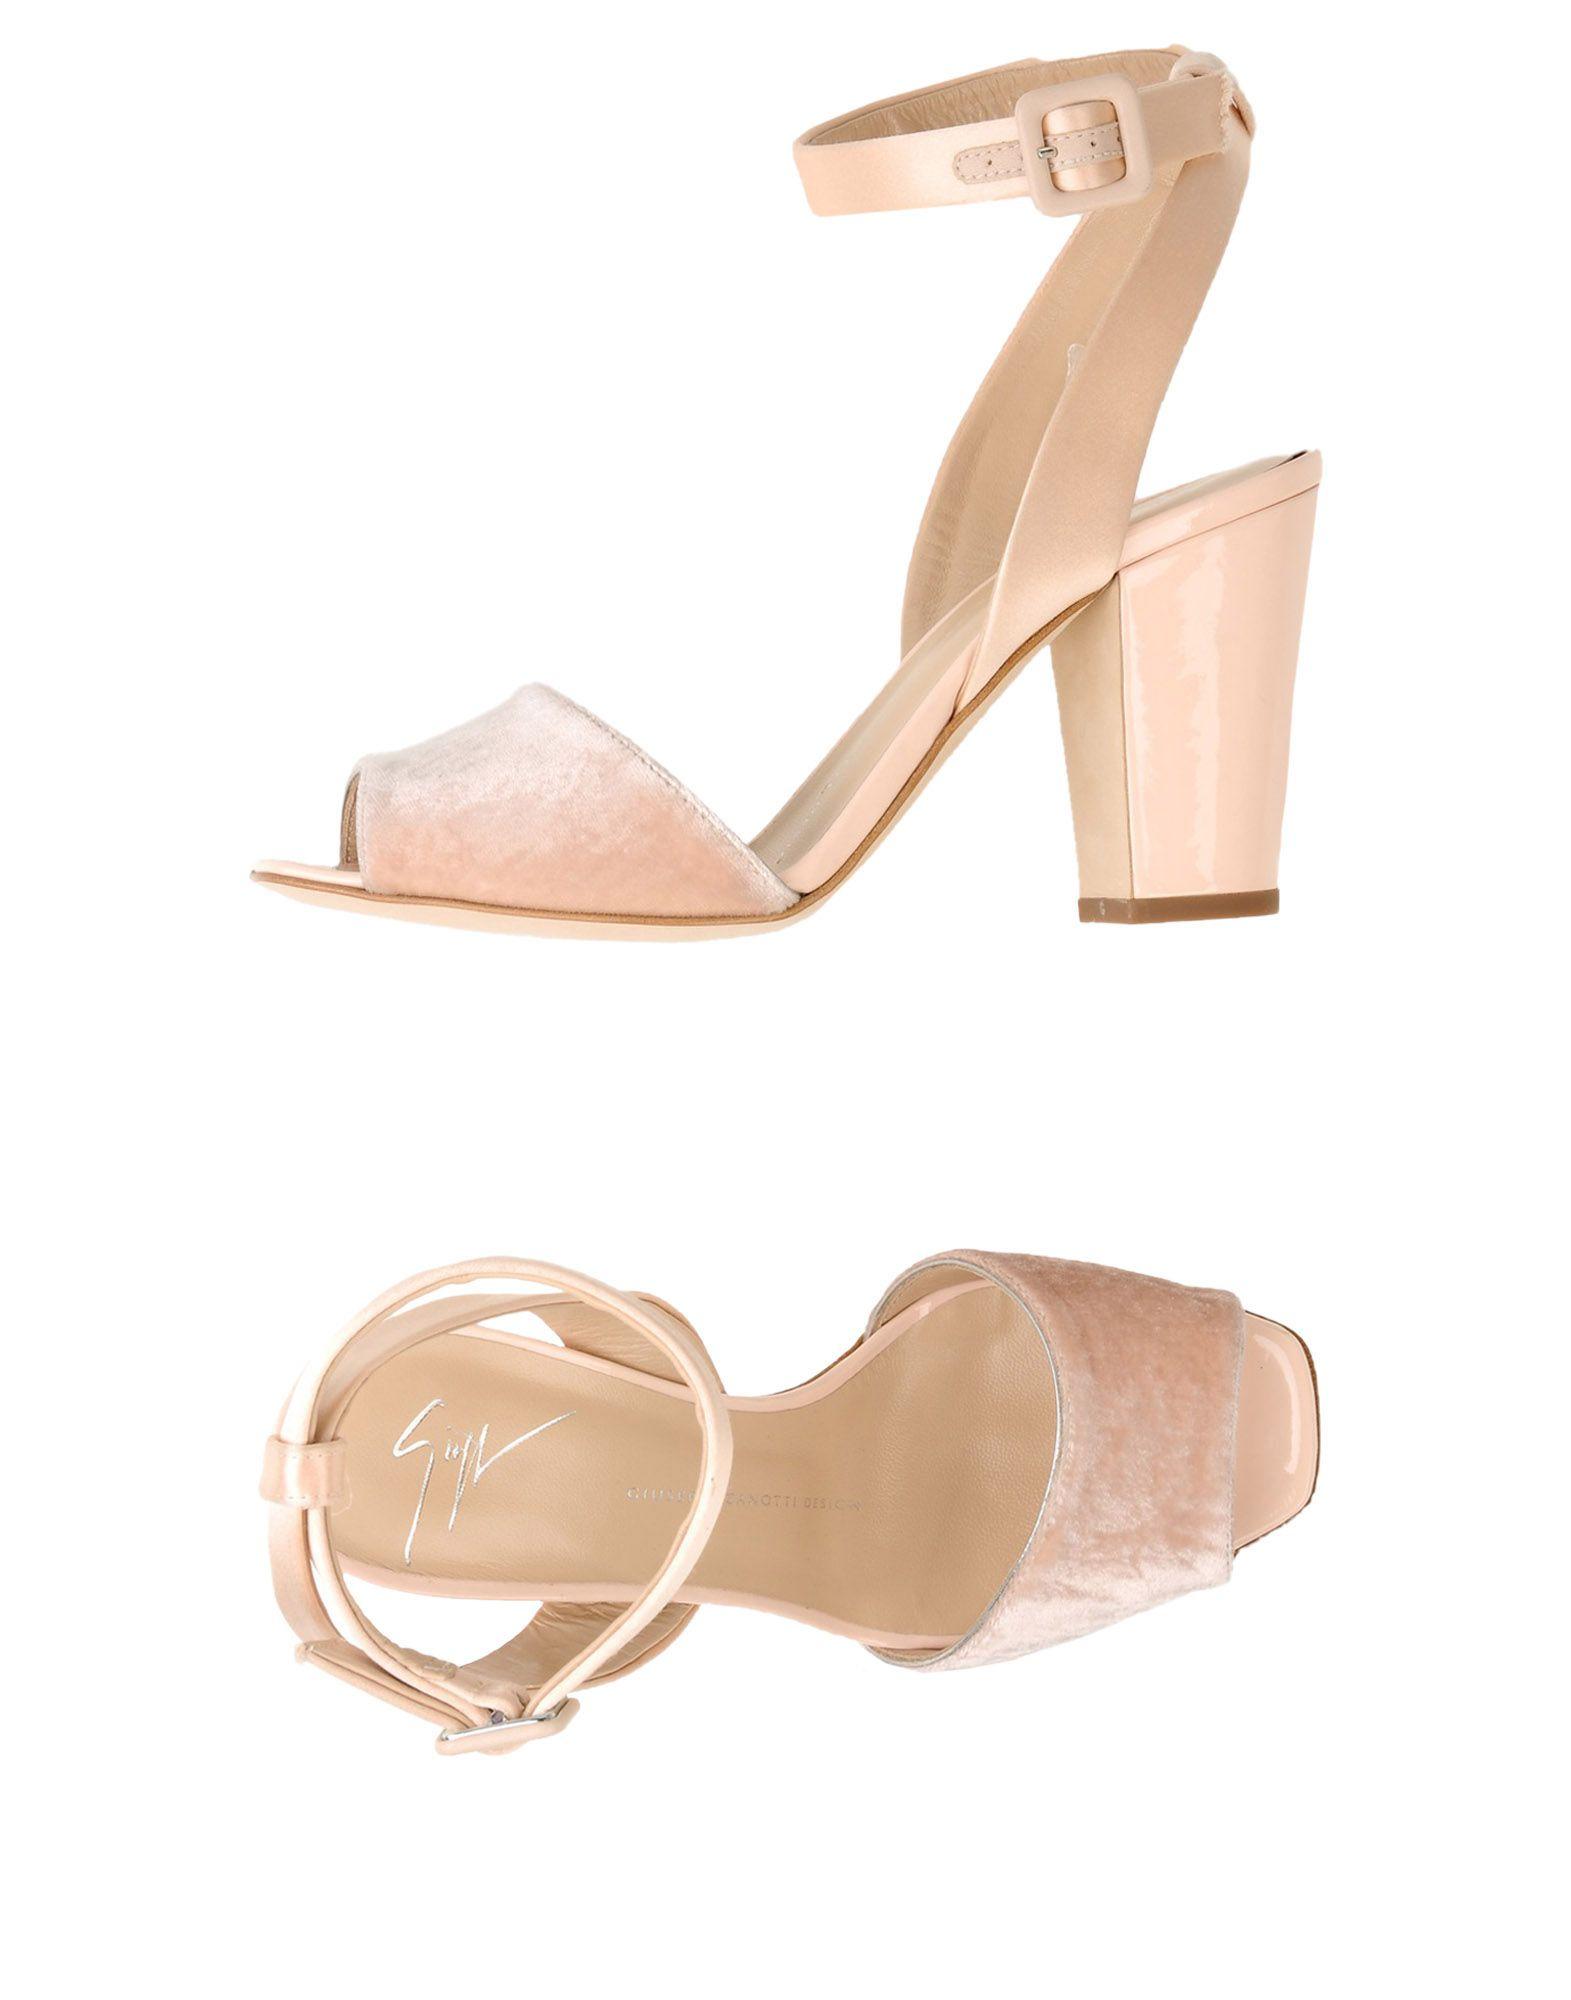 Giuseppe Zanotti Sandalen Damen  11357581JKGut aussehende strapazierfähige Schuhe